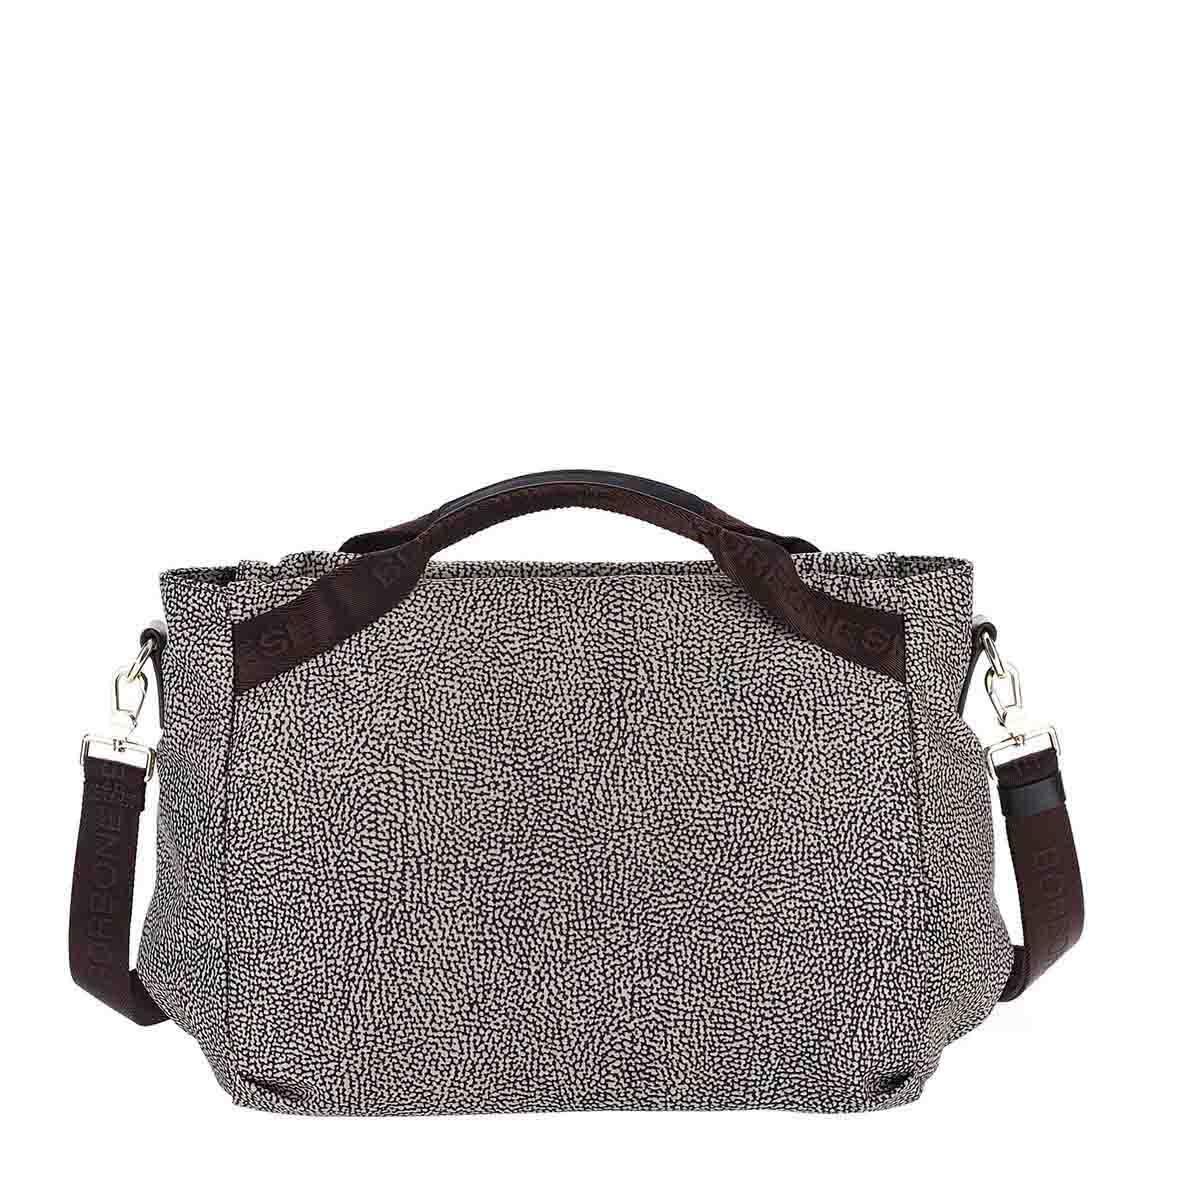 Borbonese Medium Hand Bag